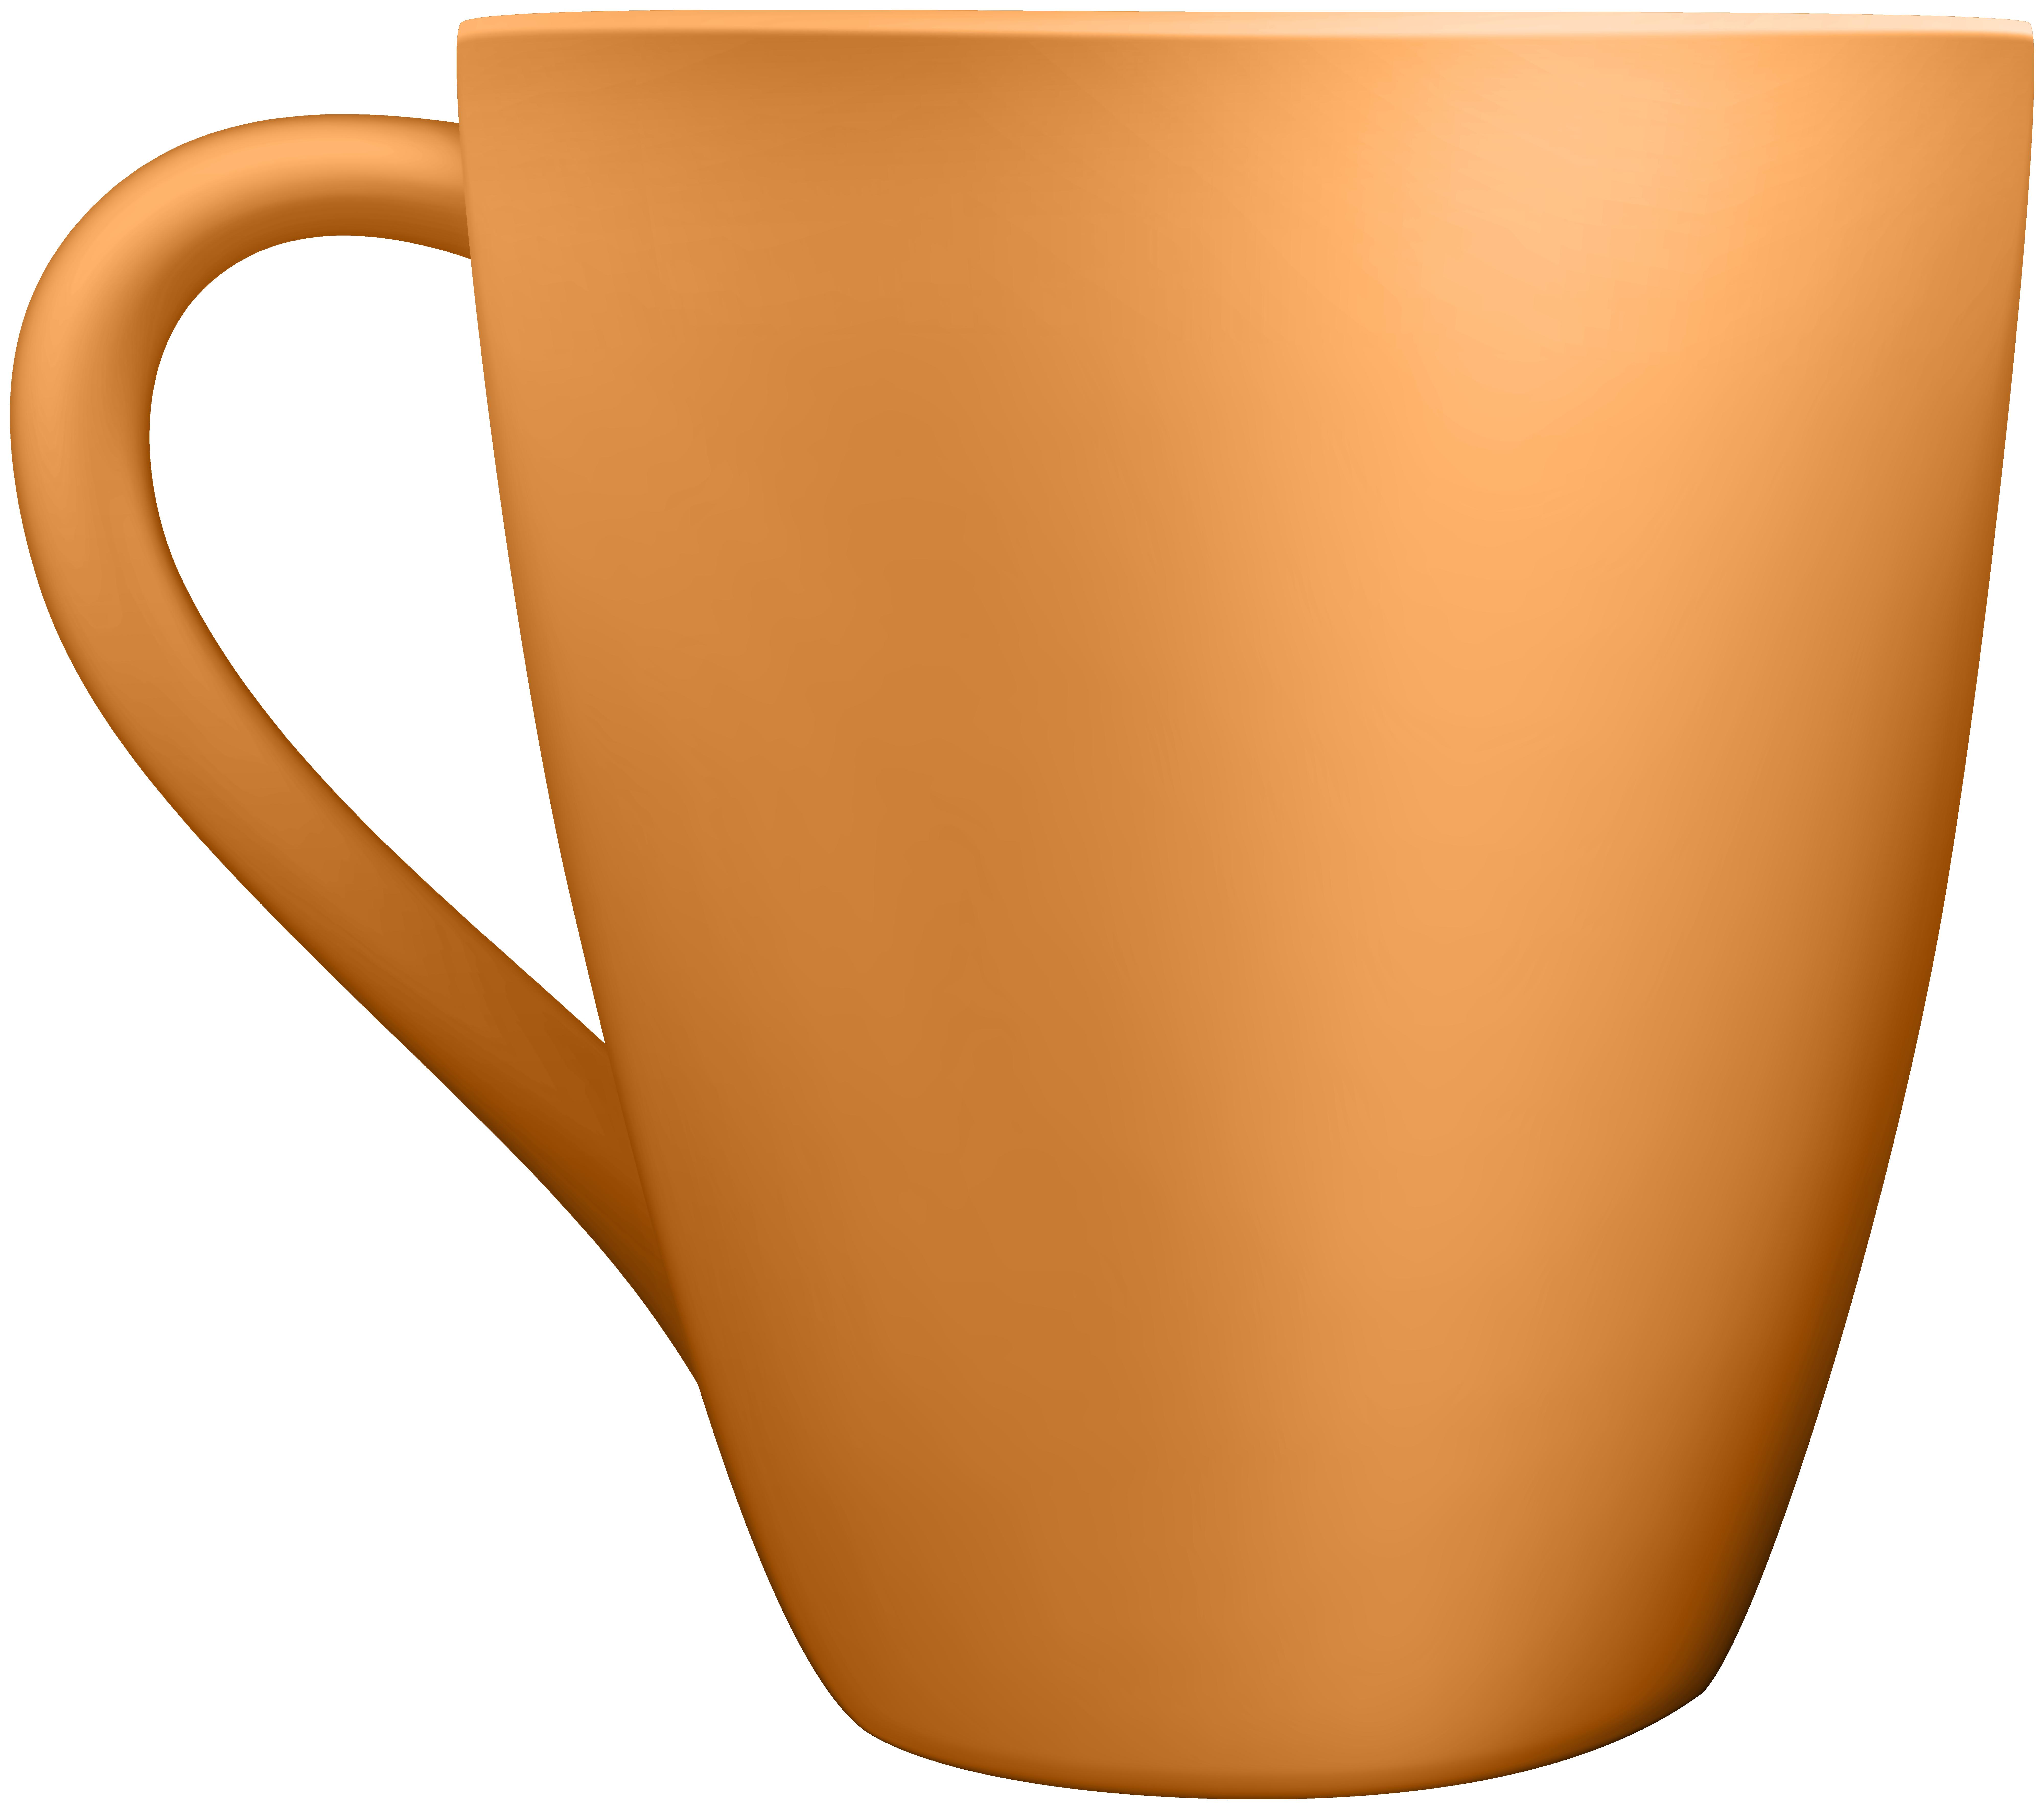 Orange Ceramic Mug Clip Art.